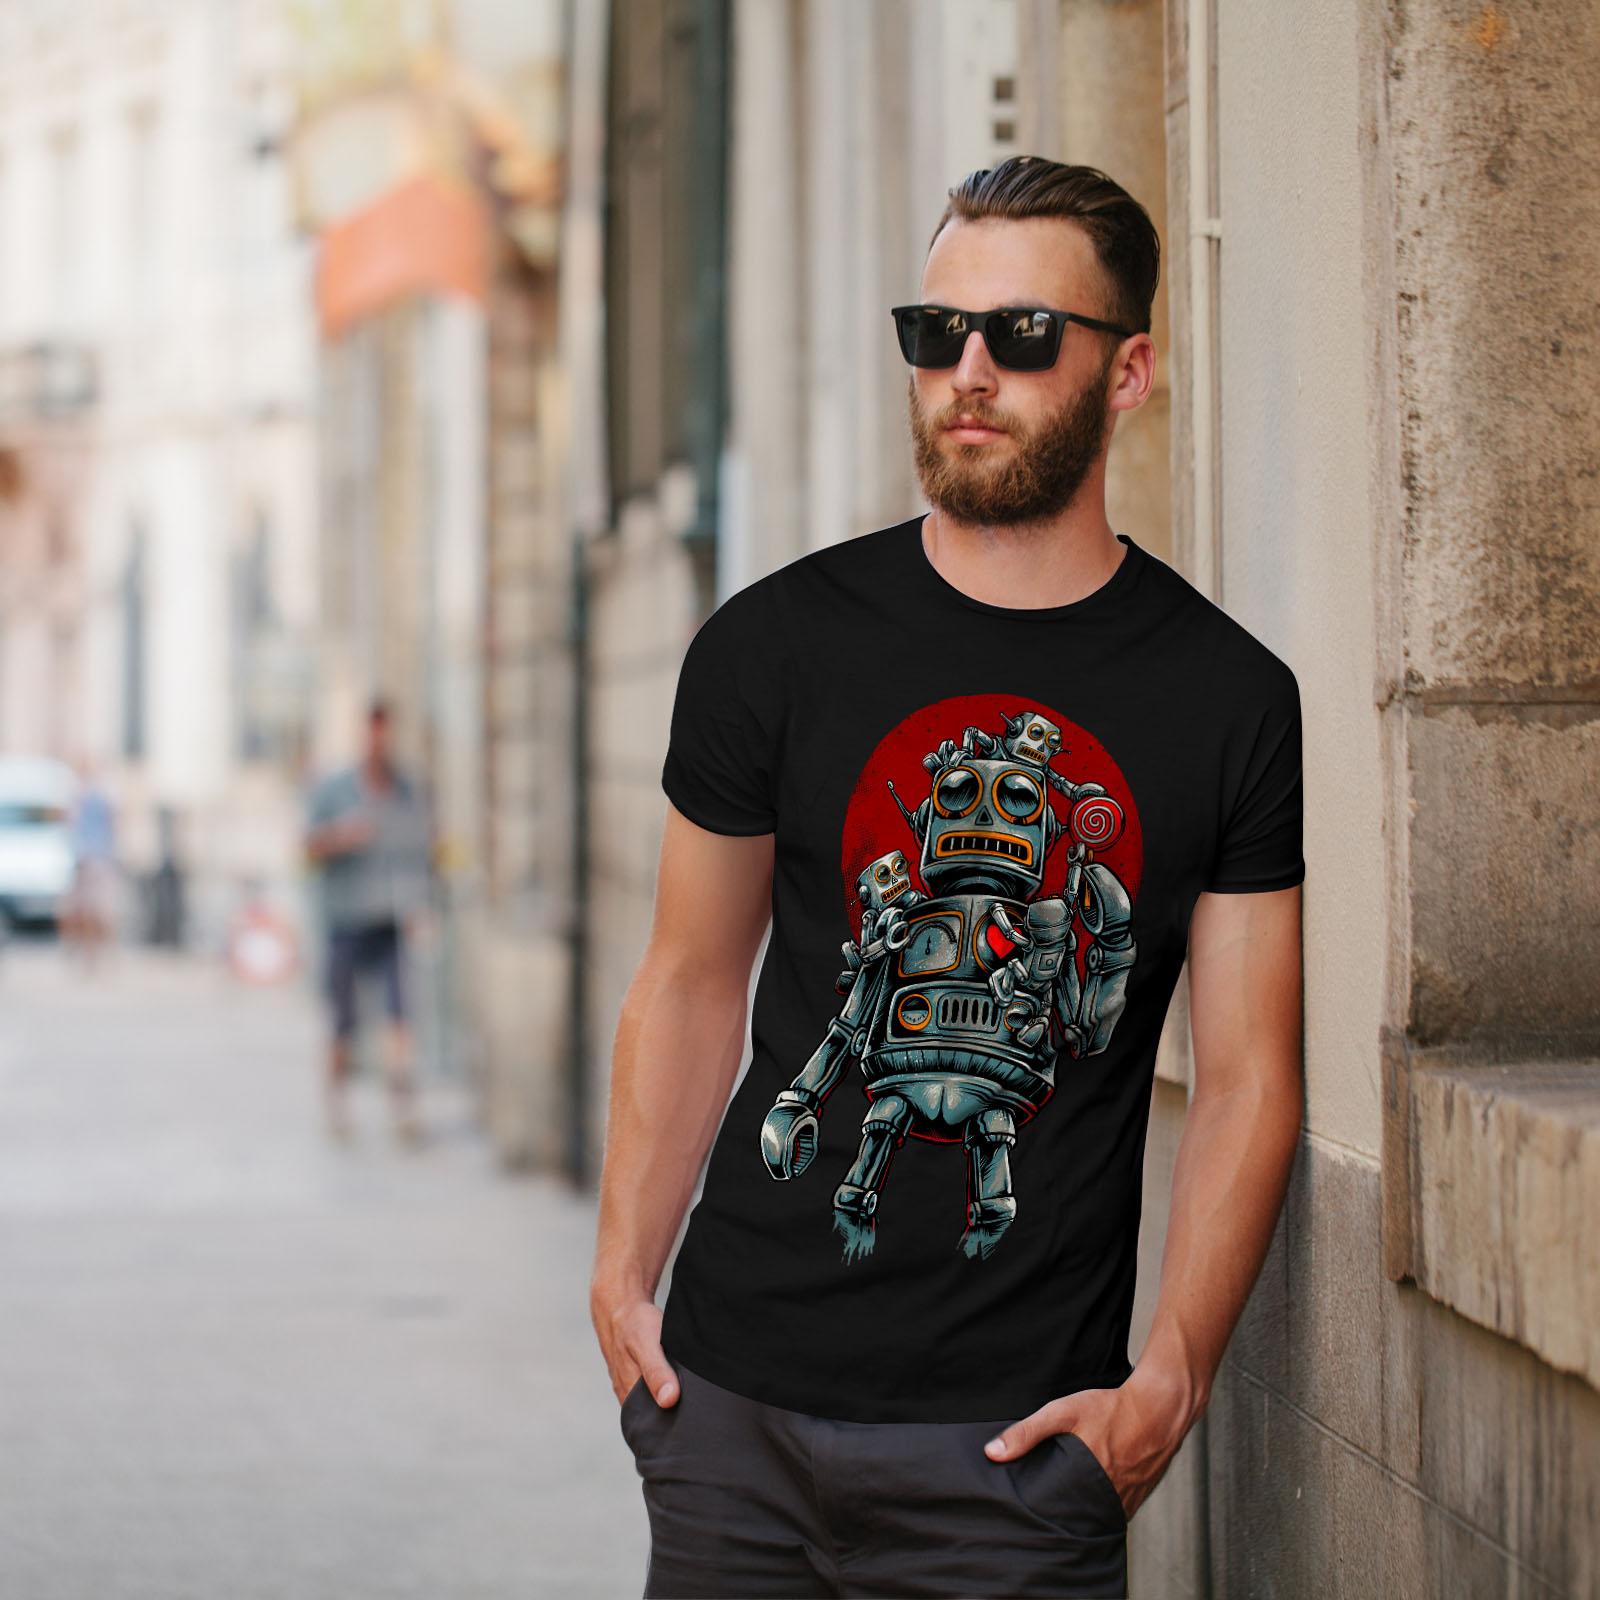 miniature 5 - Wellcoda Crazy Robot Mens T-shirt, Mechanical Graphic Design Printed Tee